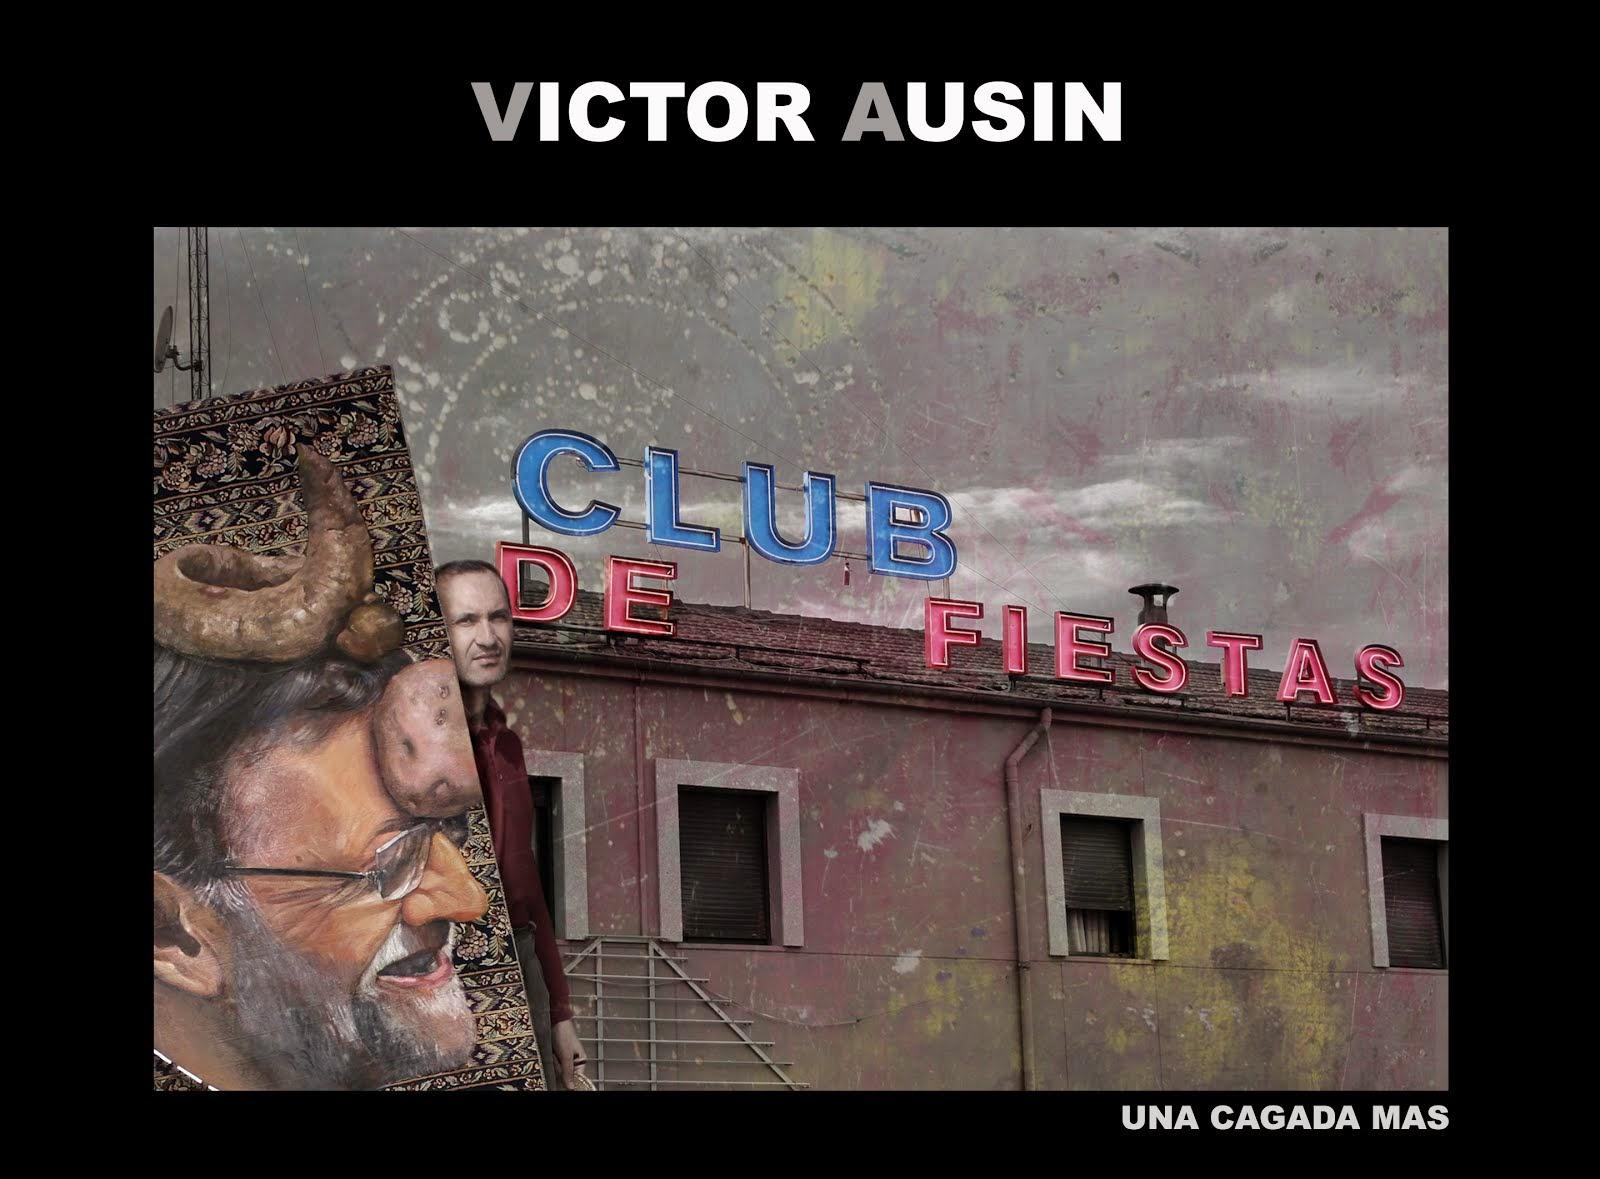 VICTOR AUSIN